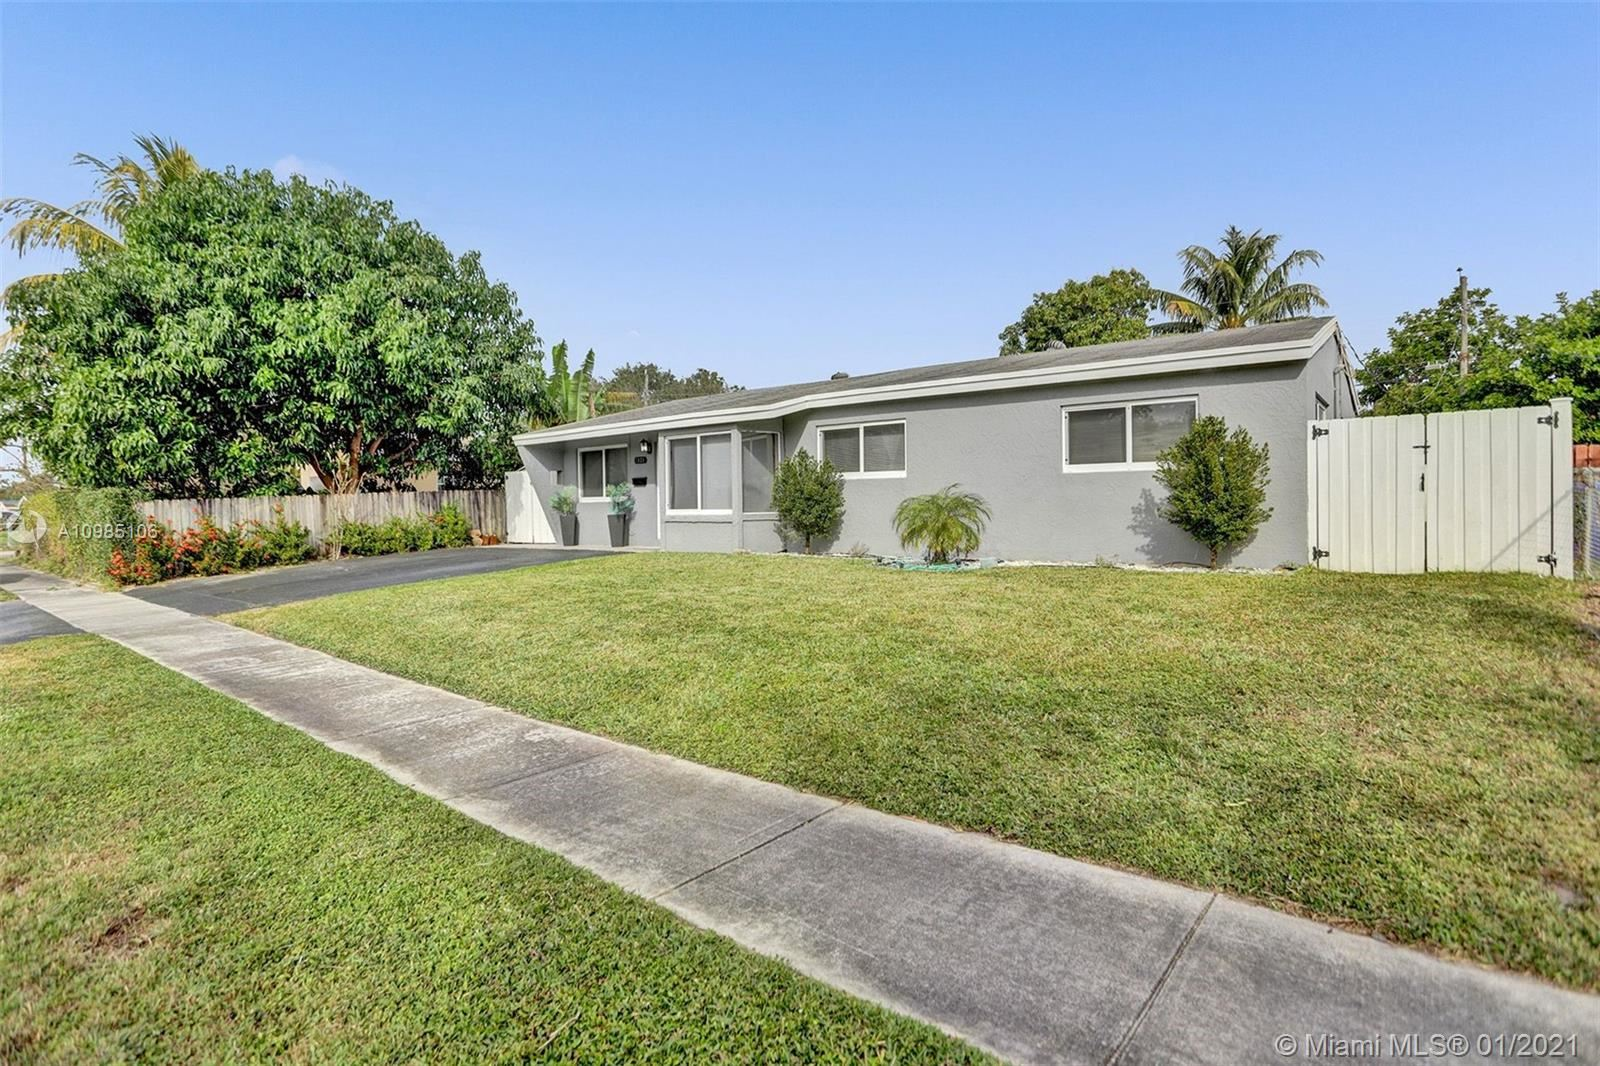 Photo of 7021 Scott St, Hollywood, FL 33024 (MLS # A10985106)